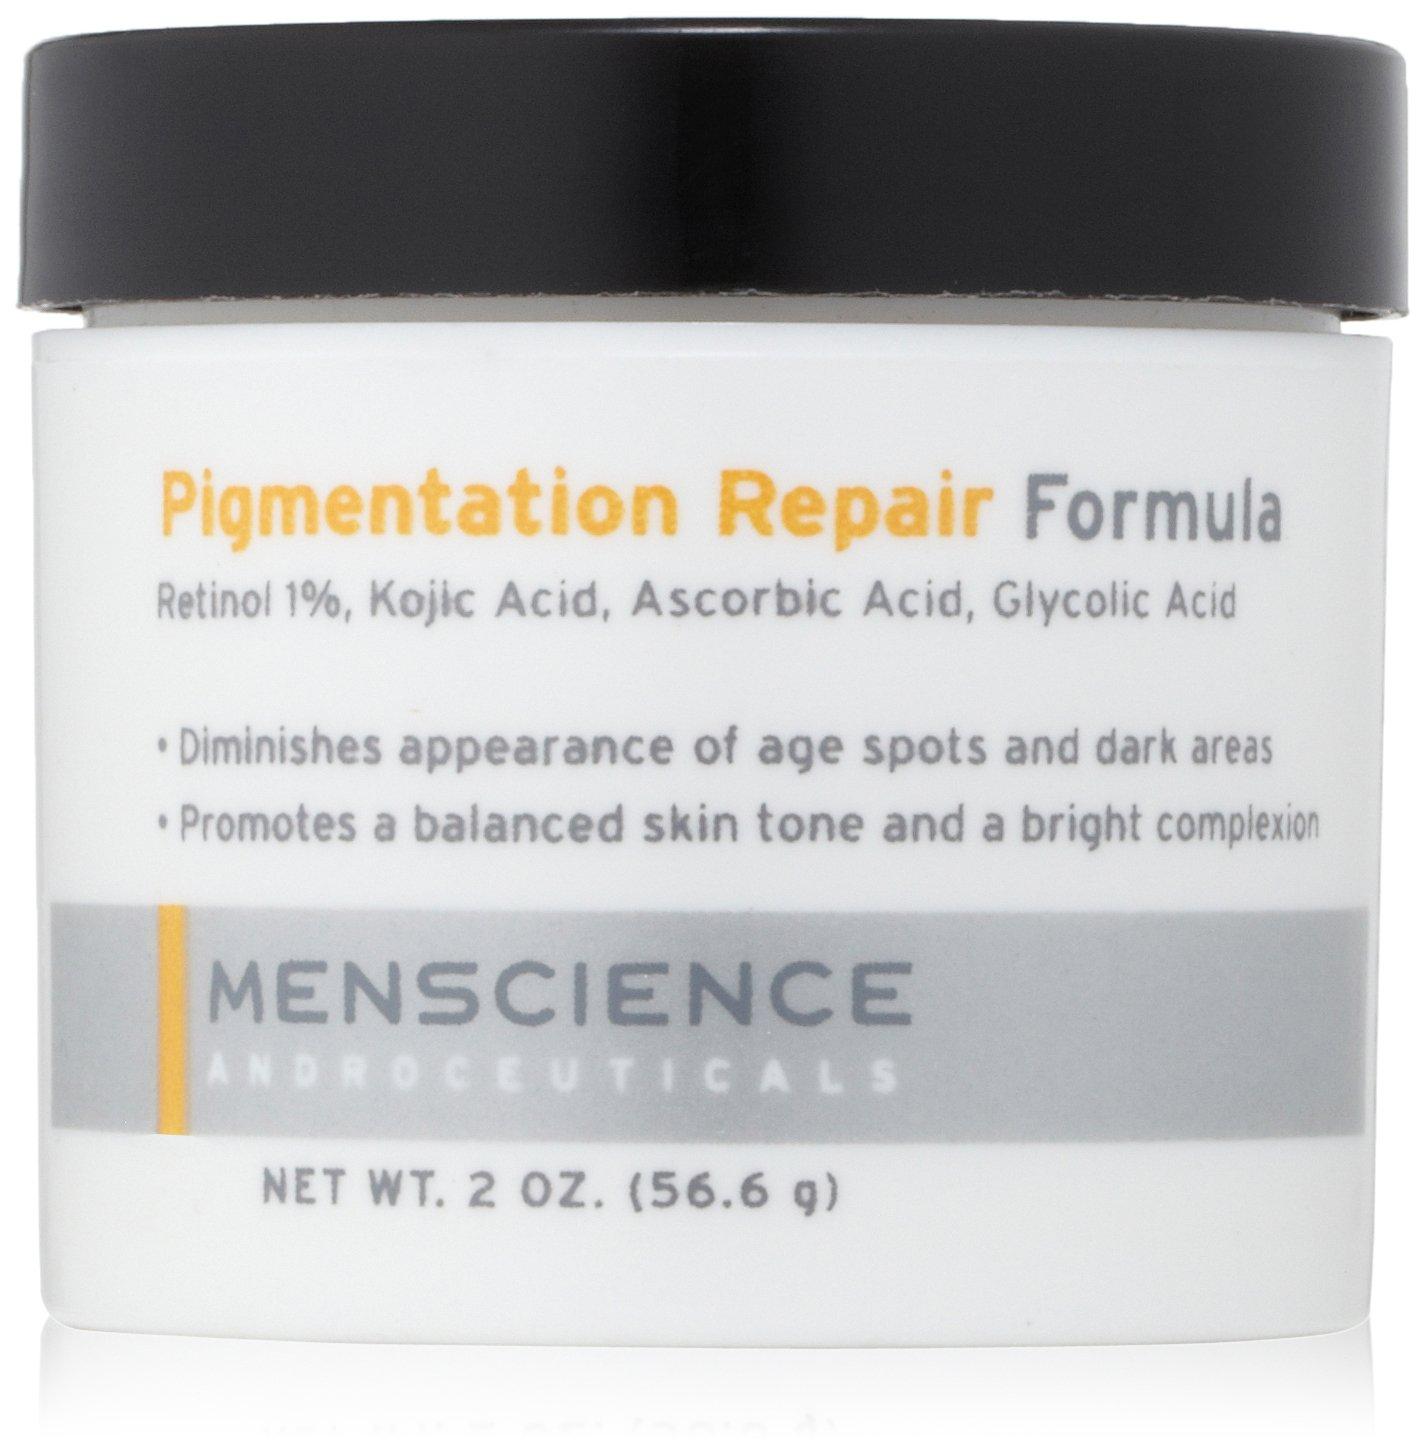 MenScience Androceuticals Pigmentation Repair Formula, 2 oz.